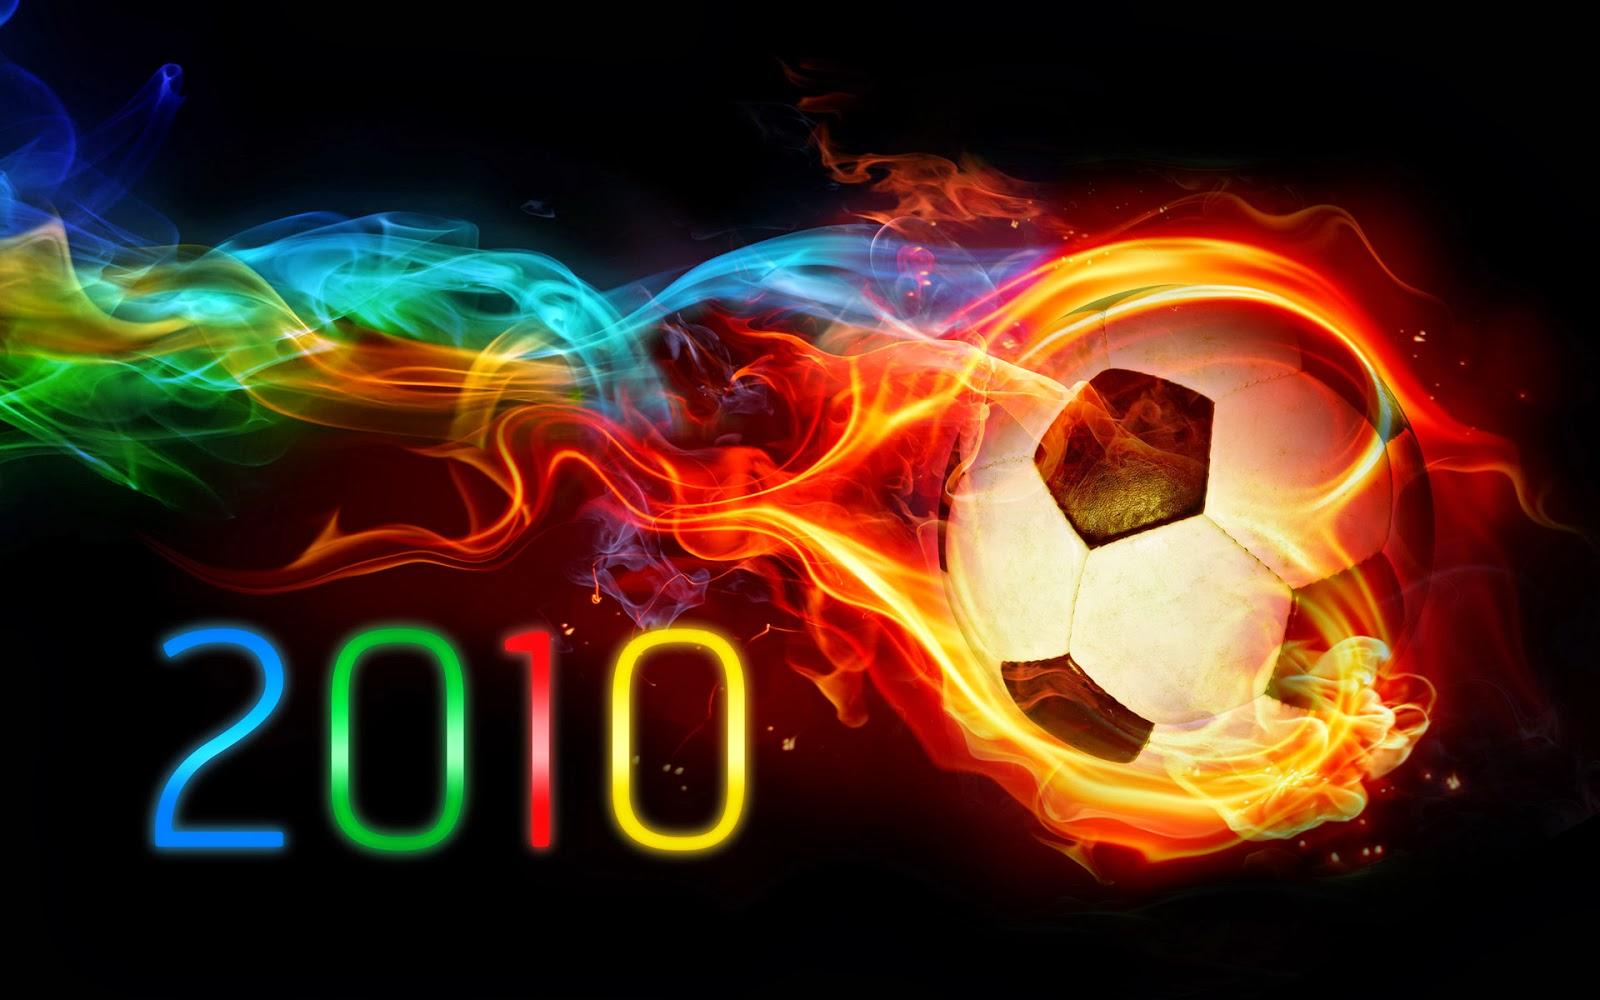 Football Wallpapers computer   beautiful desktop wallpapers 2014 1600x1000